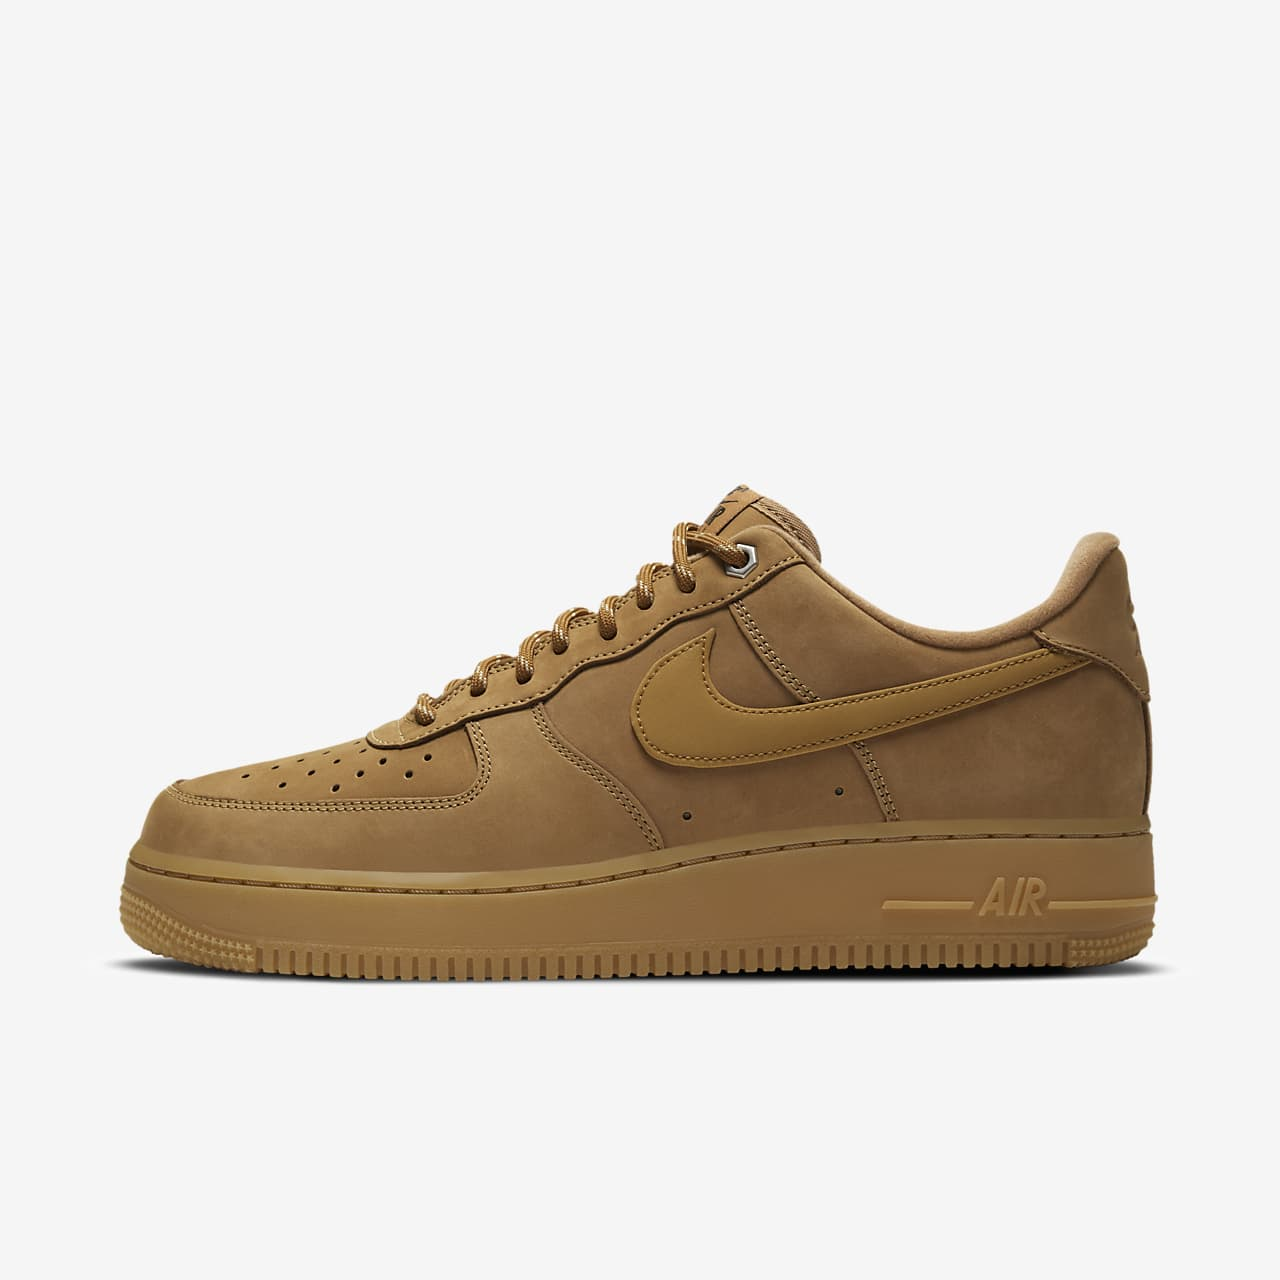 Nike Air Force 1 '07 WB herresko